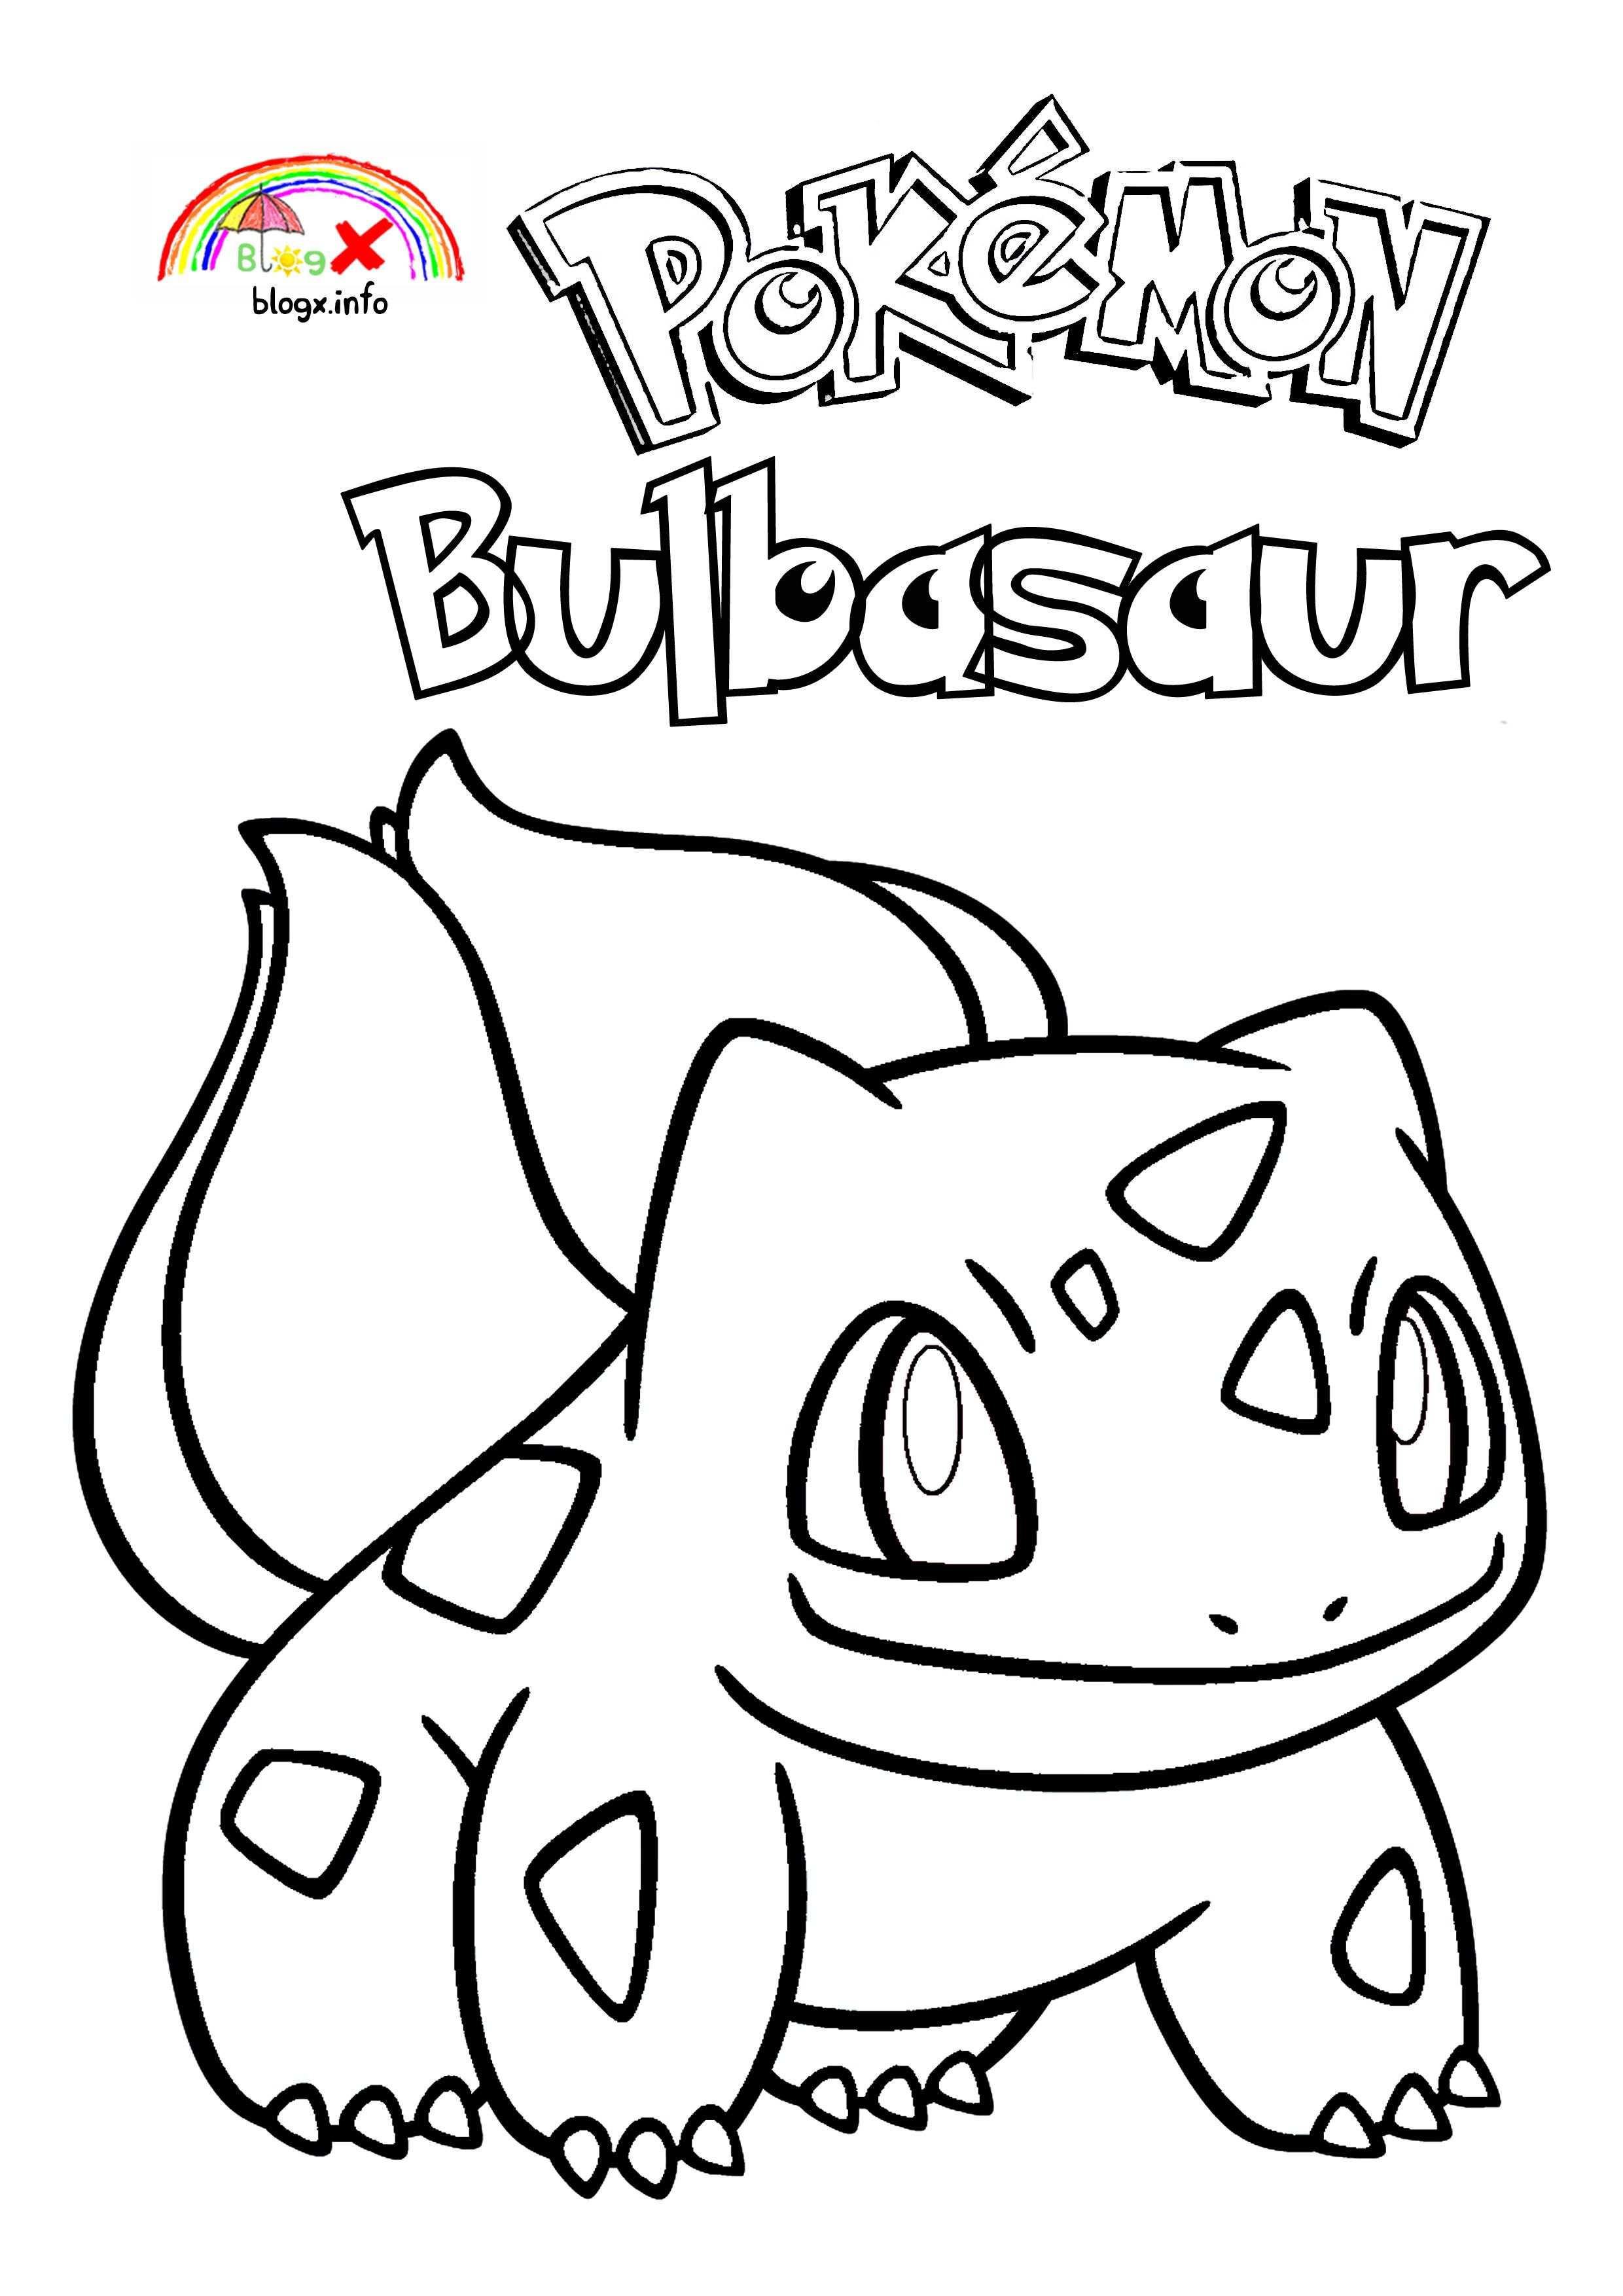 Pokemon Bulbasaur Coloring Page blogX.info  Pokemon bulbasaur